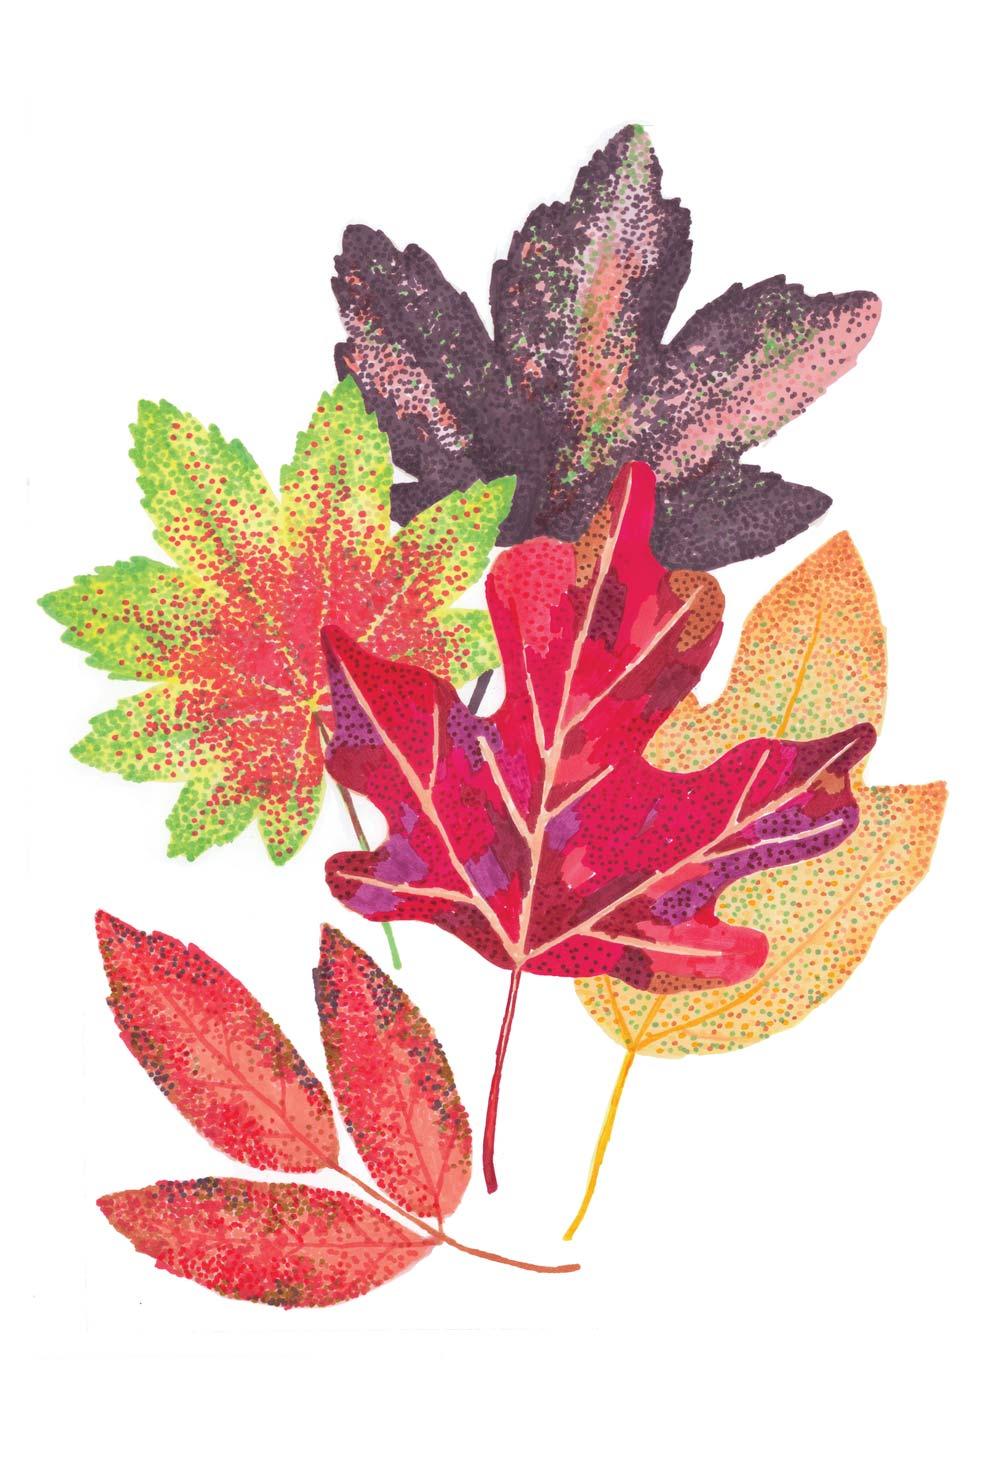 T11_foglie_colore.jpg